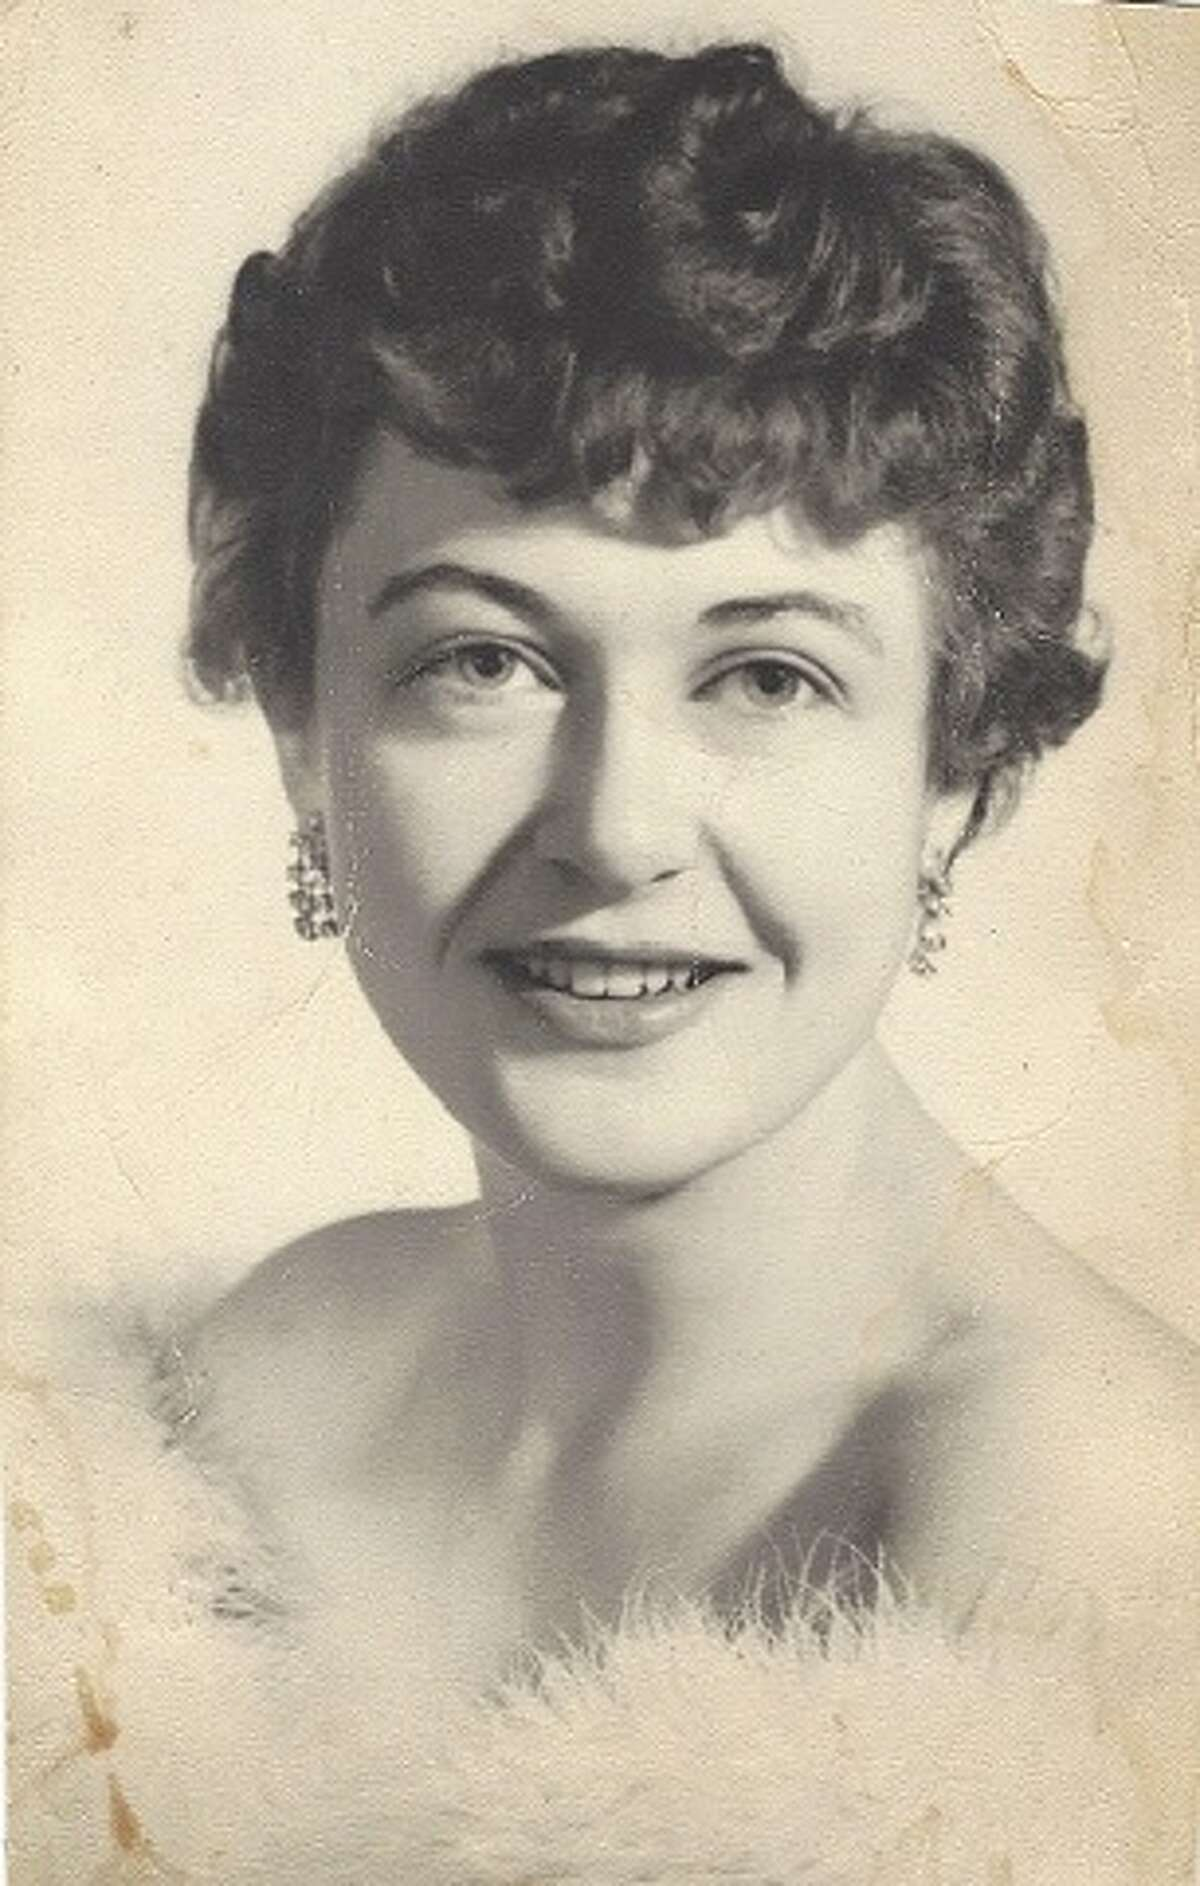 Rosemary Lynn DeJonge